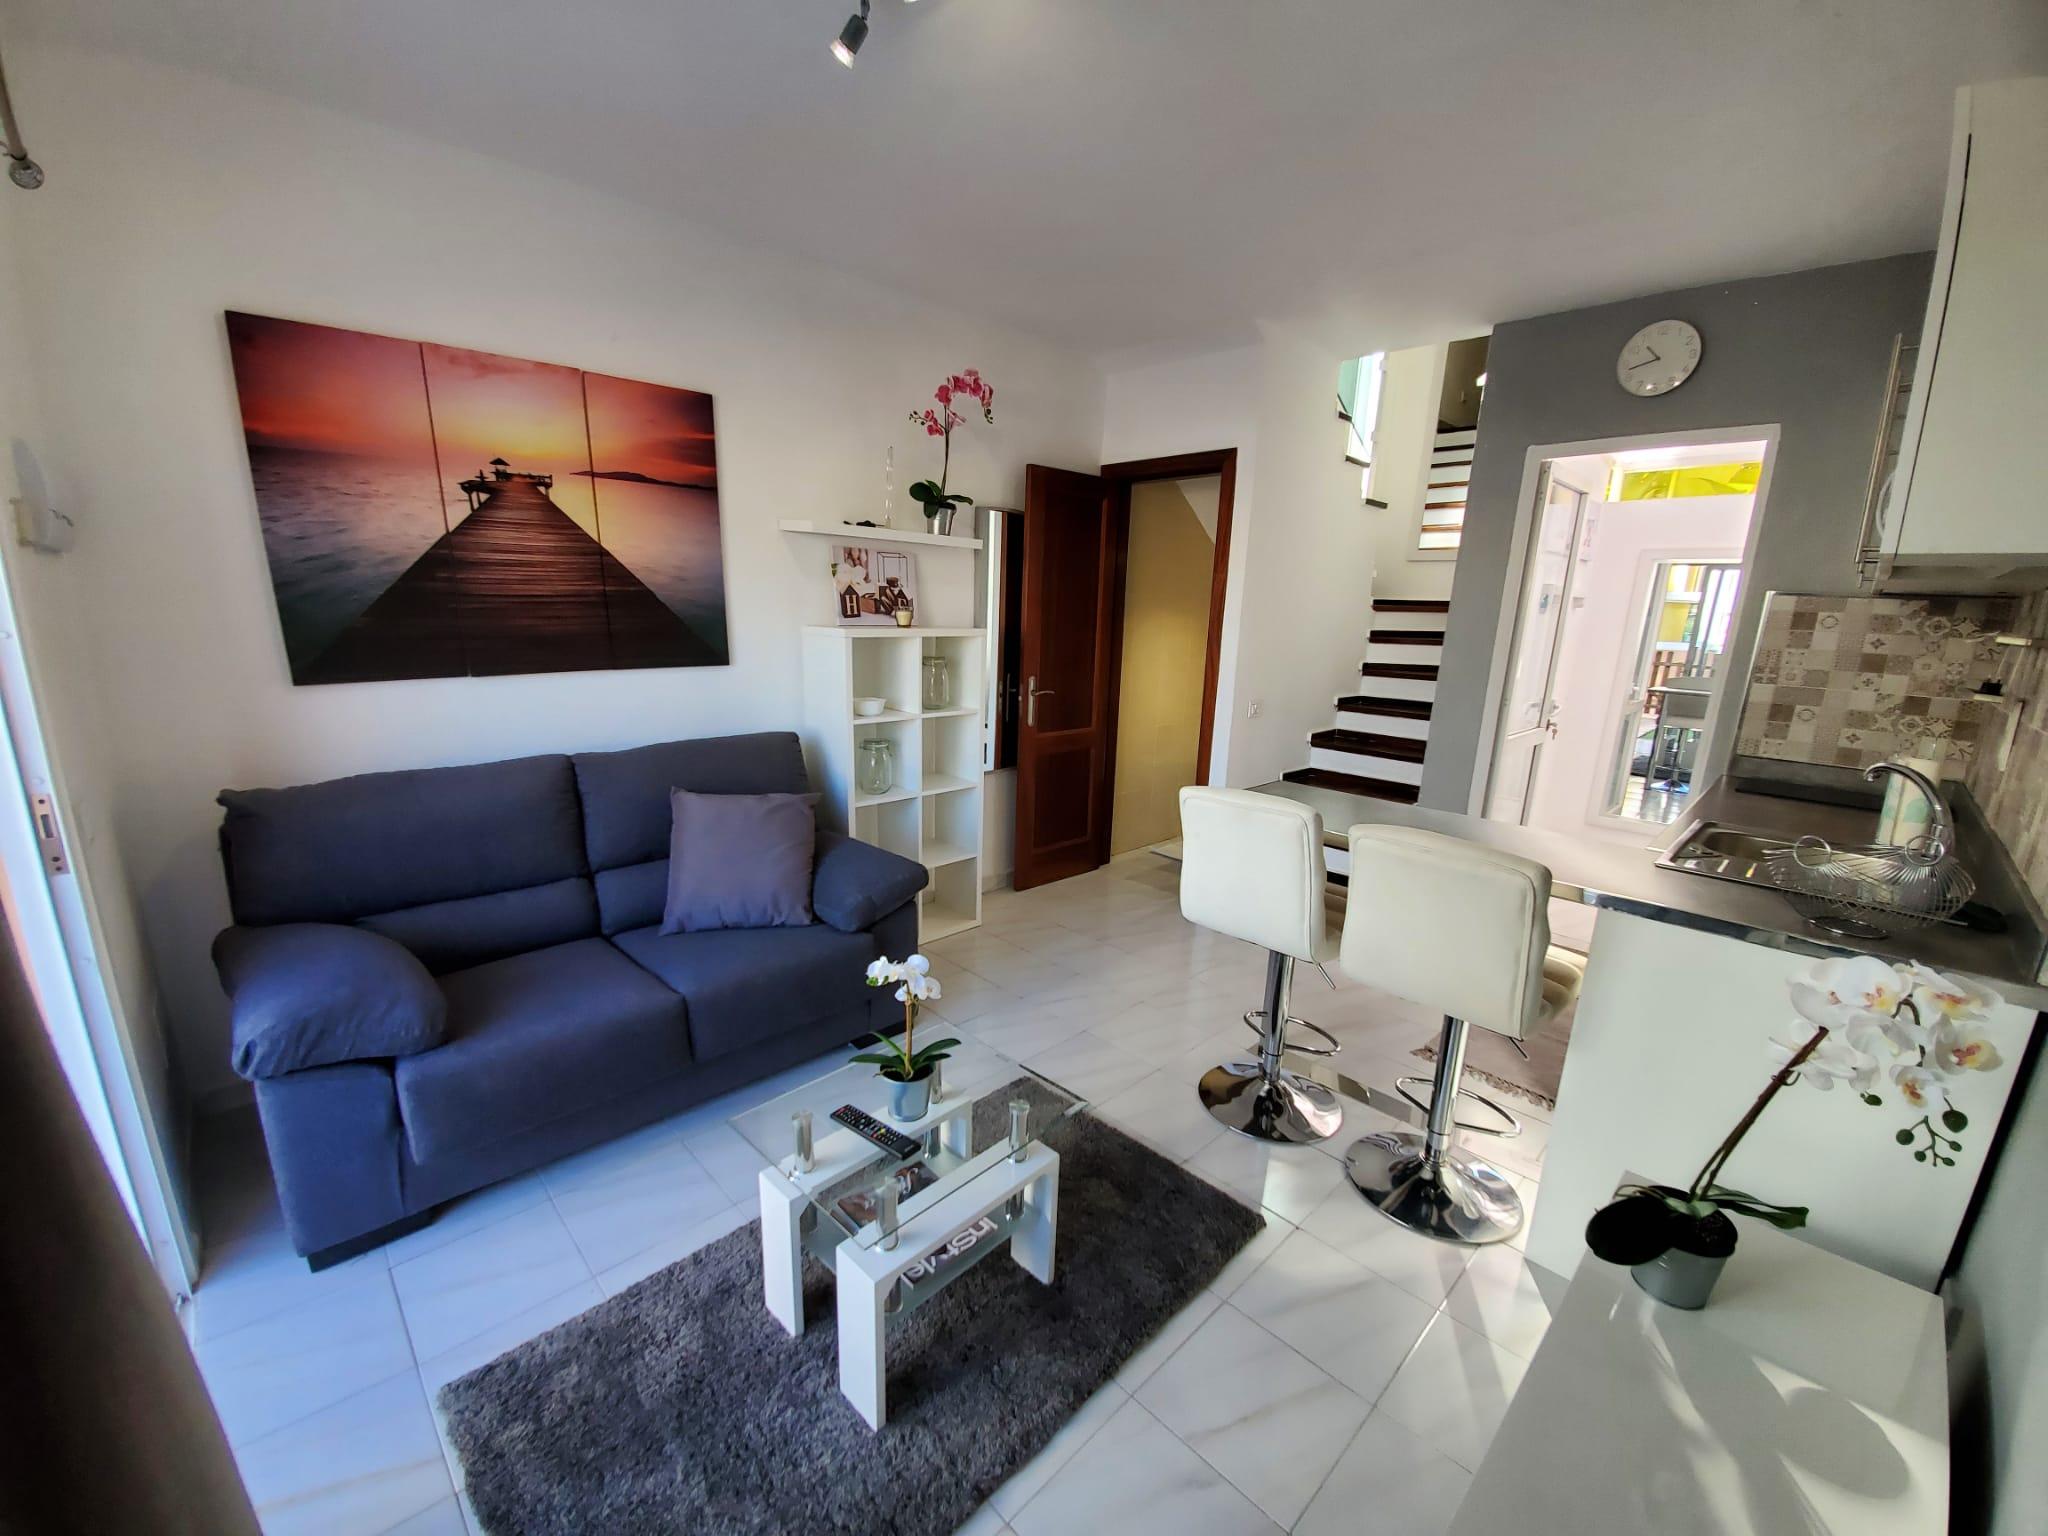 One Bedroom Bungalow in Maspalomas